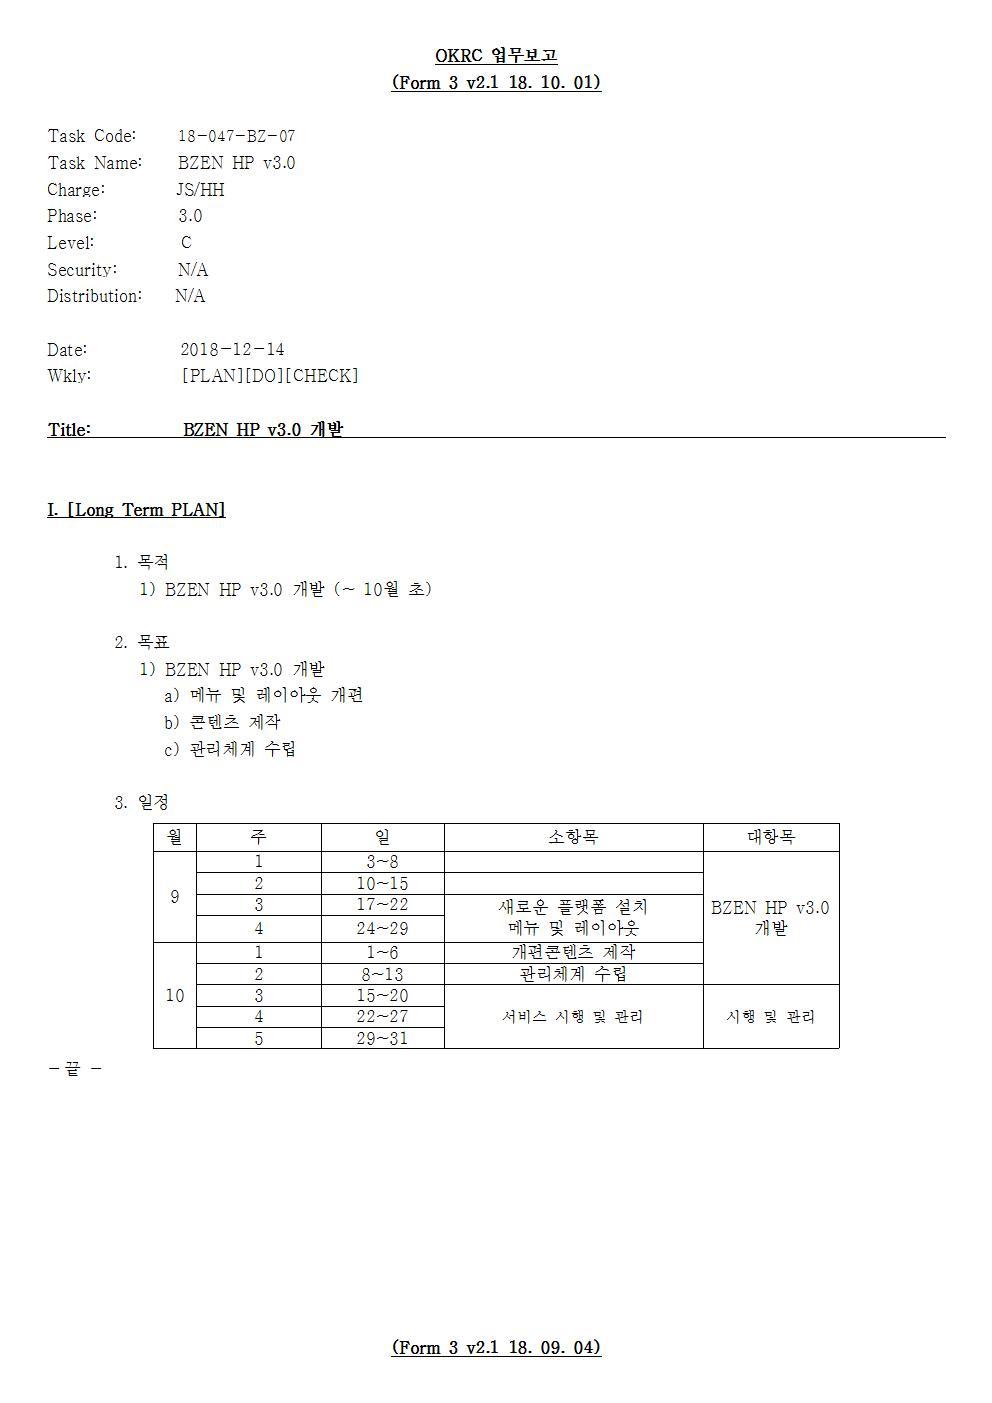 D-[18-047-BZ-07]-[BZEN HP v3.0]-[2018-12-14][HH]001.jpg